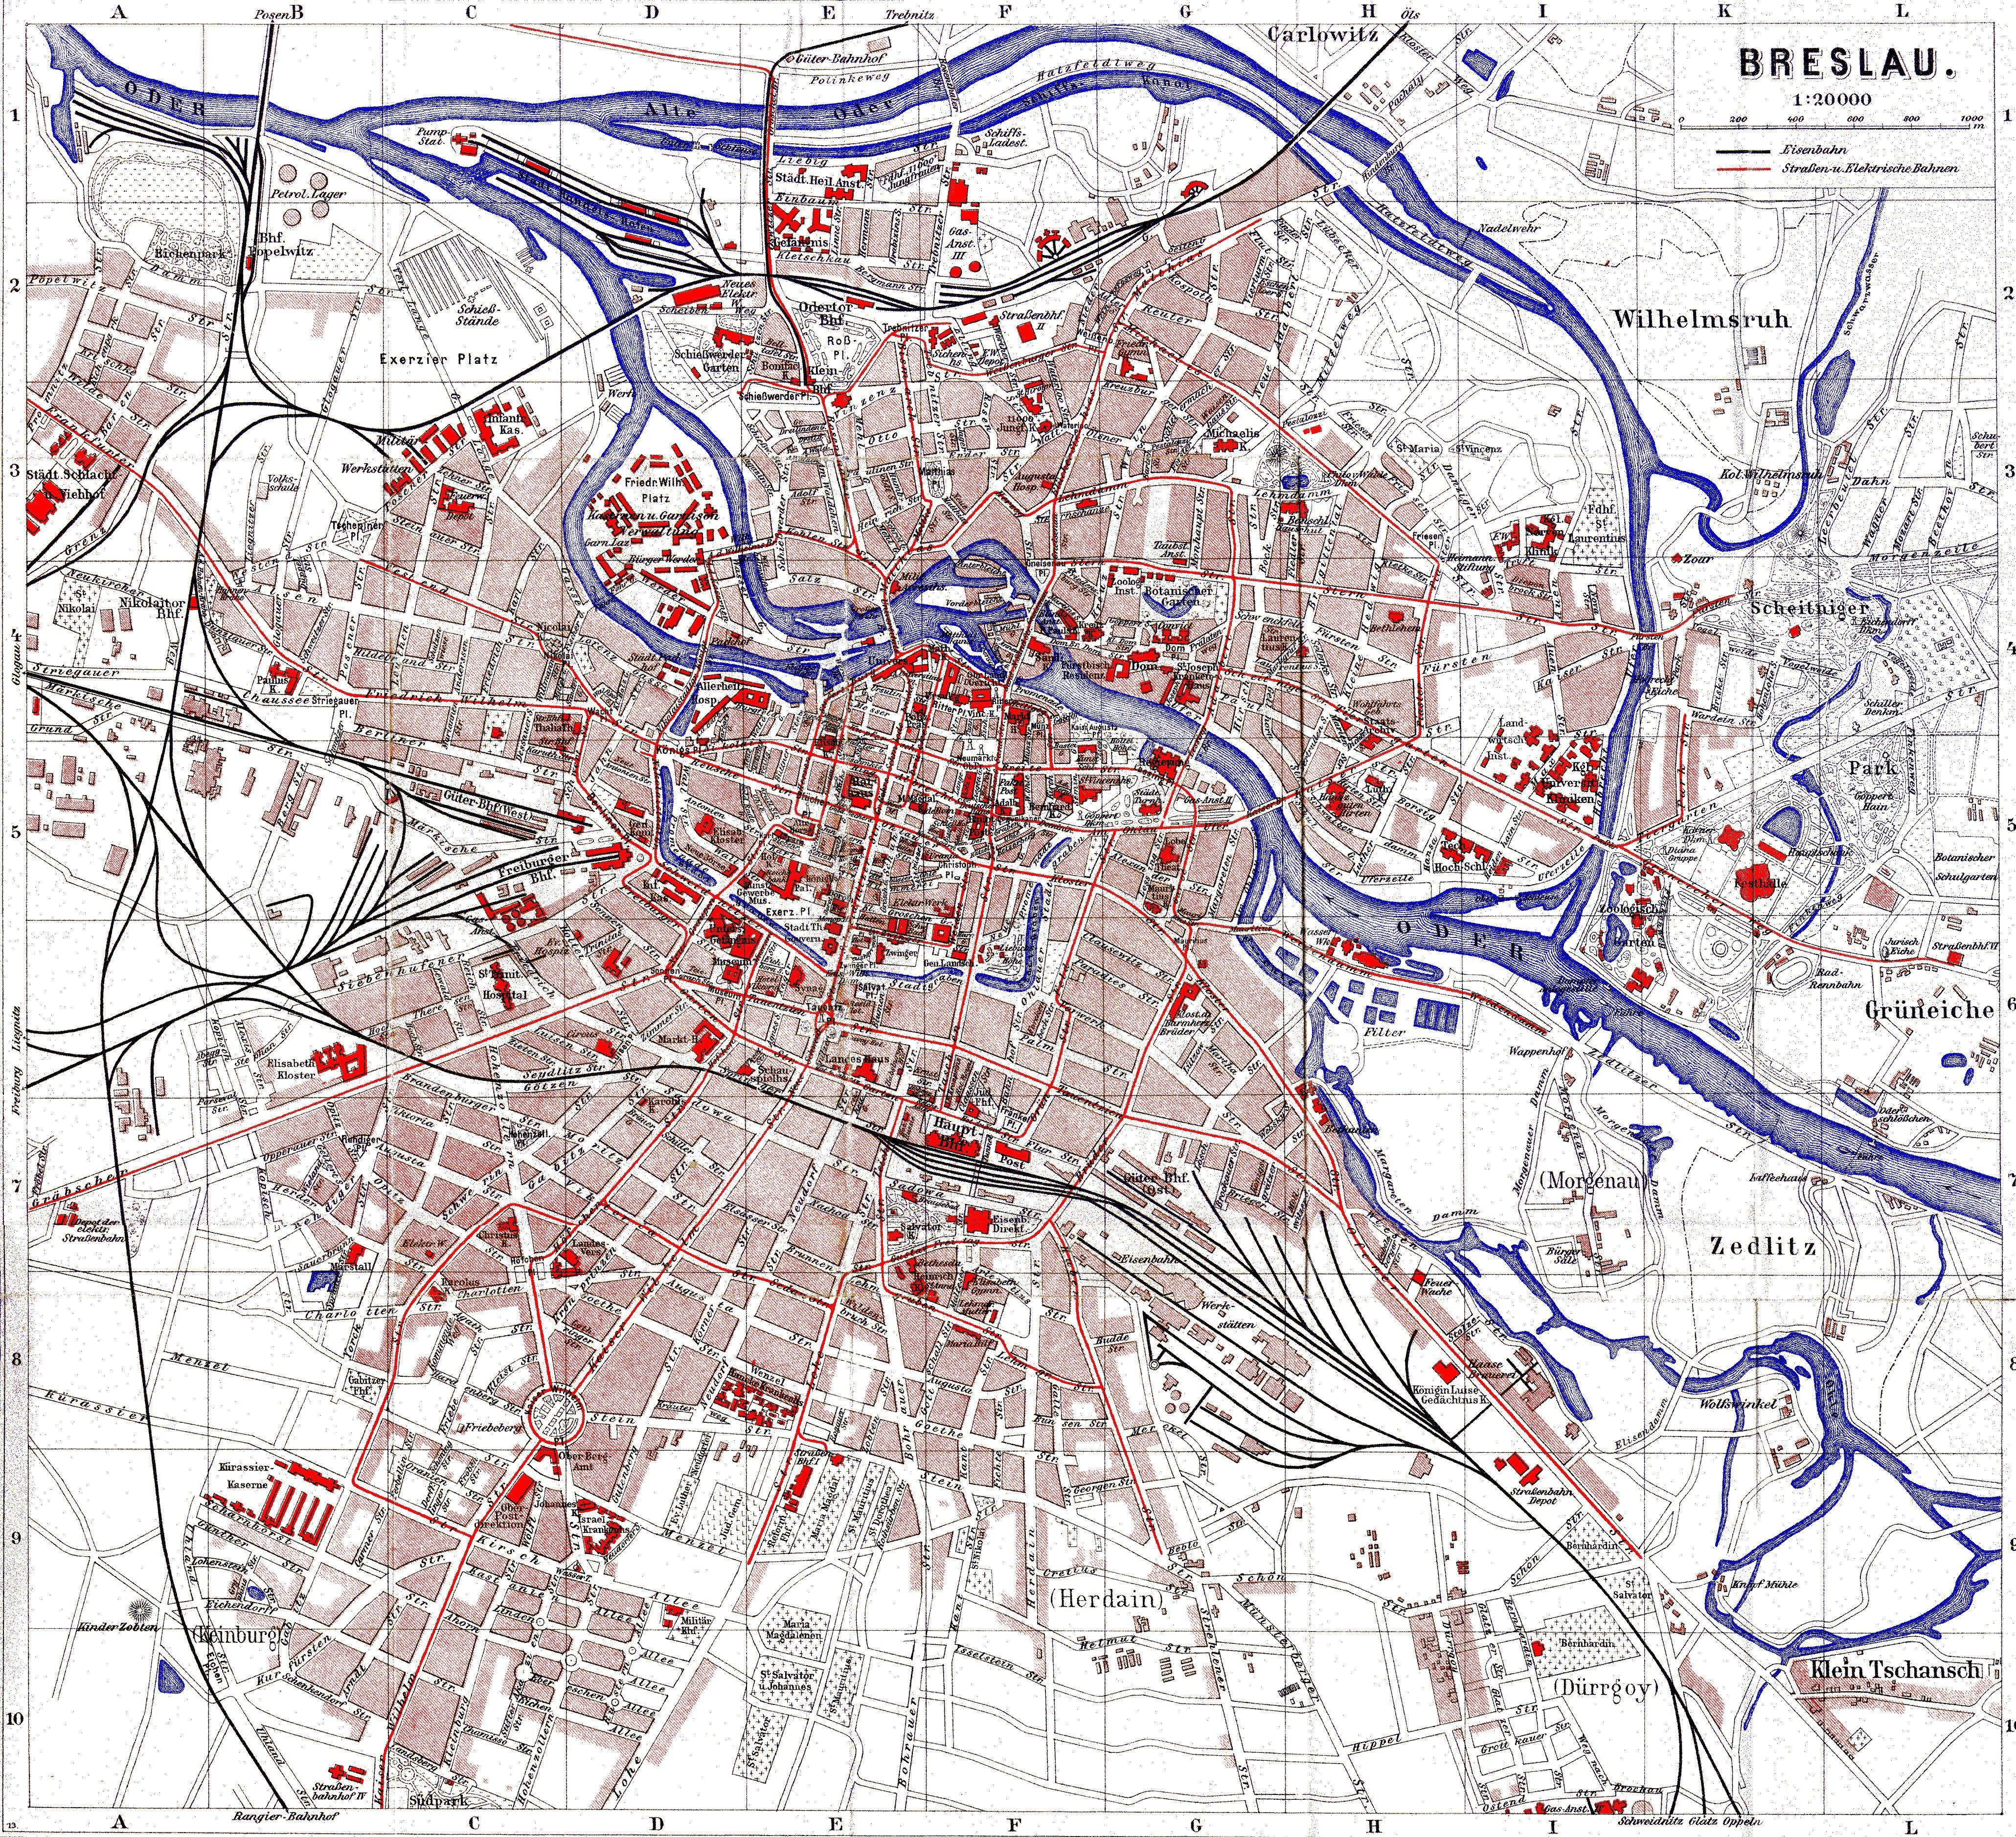 Breslau 1920 Wroclaw Genealogy Germany City Design